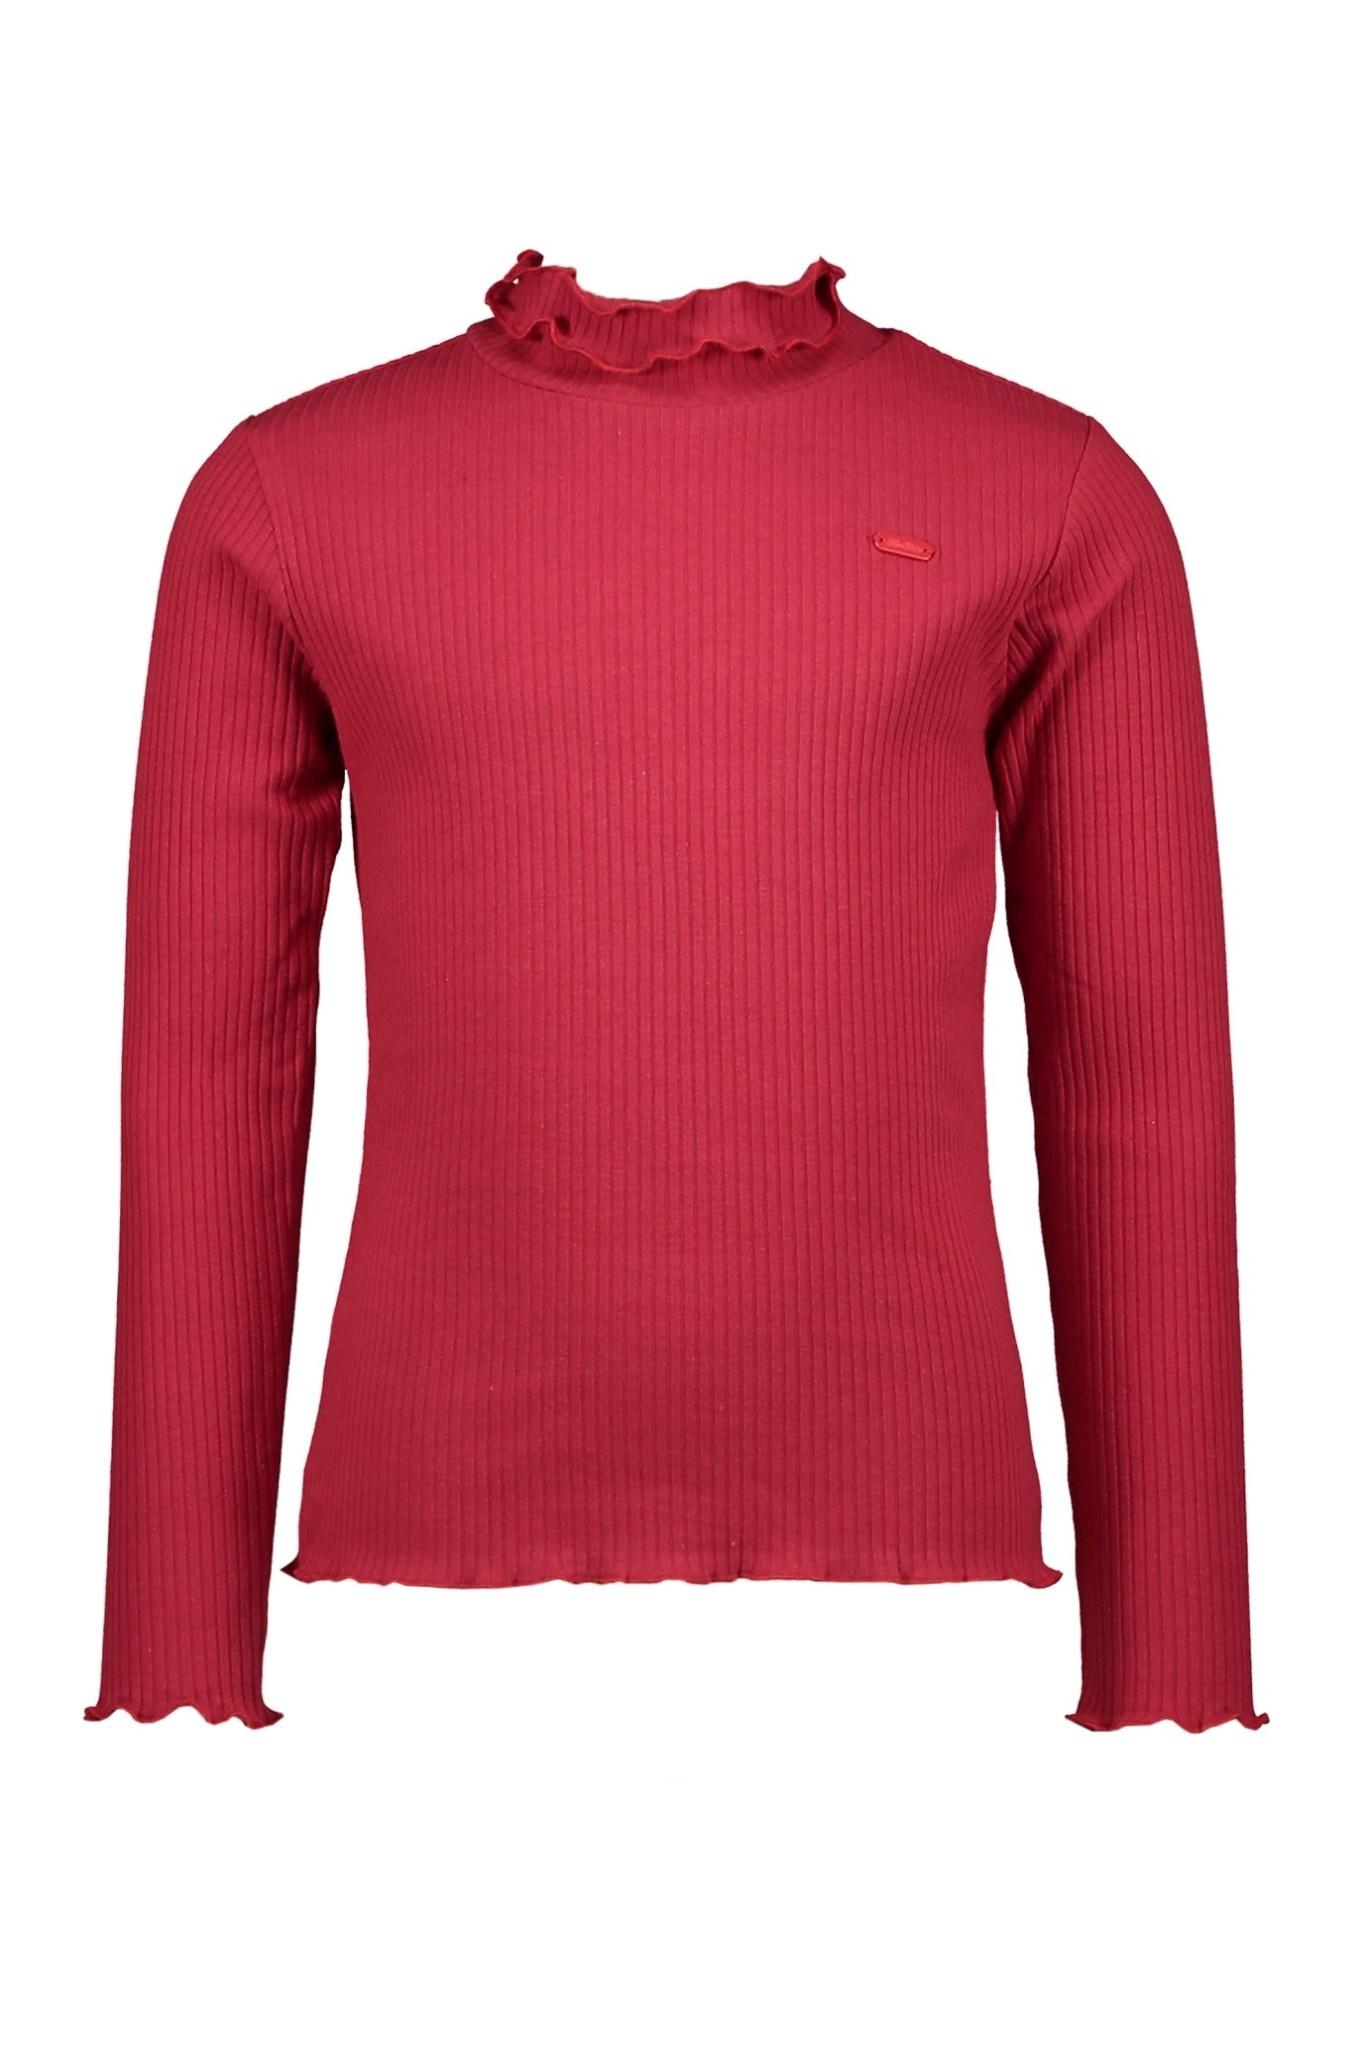 Nola Rib Turtleneck Top - Simply Red